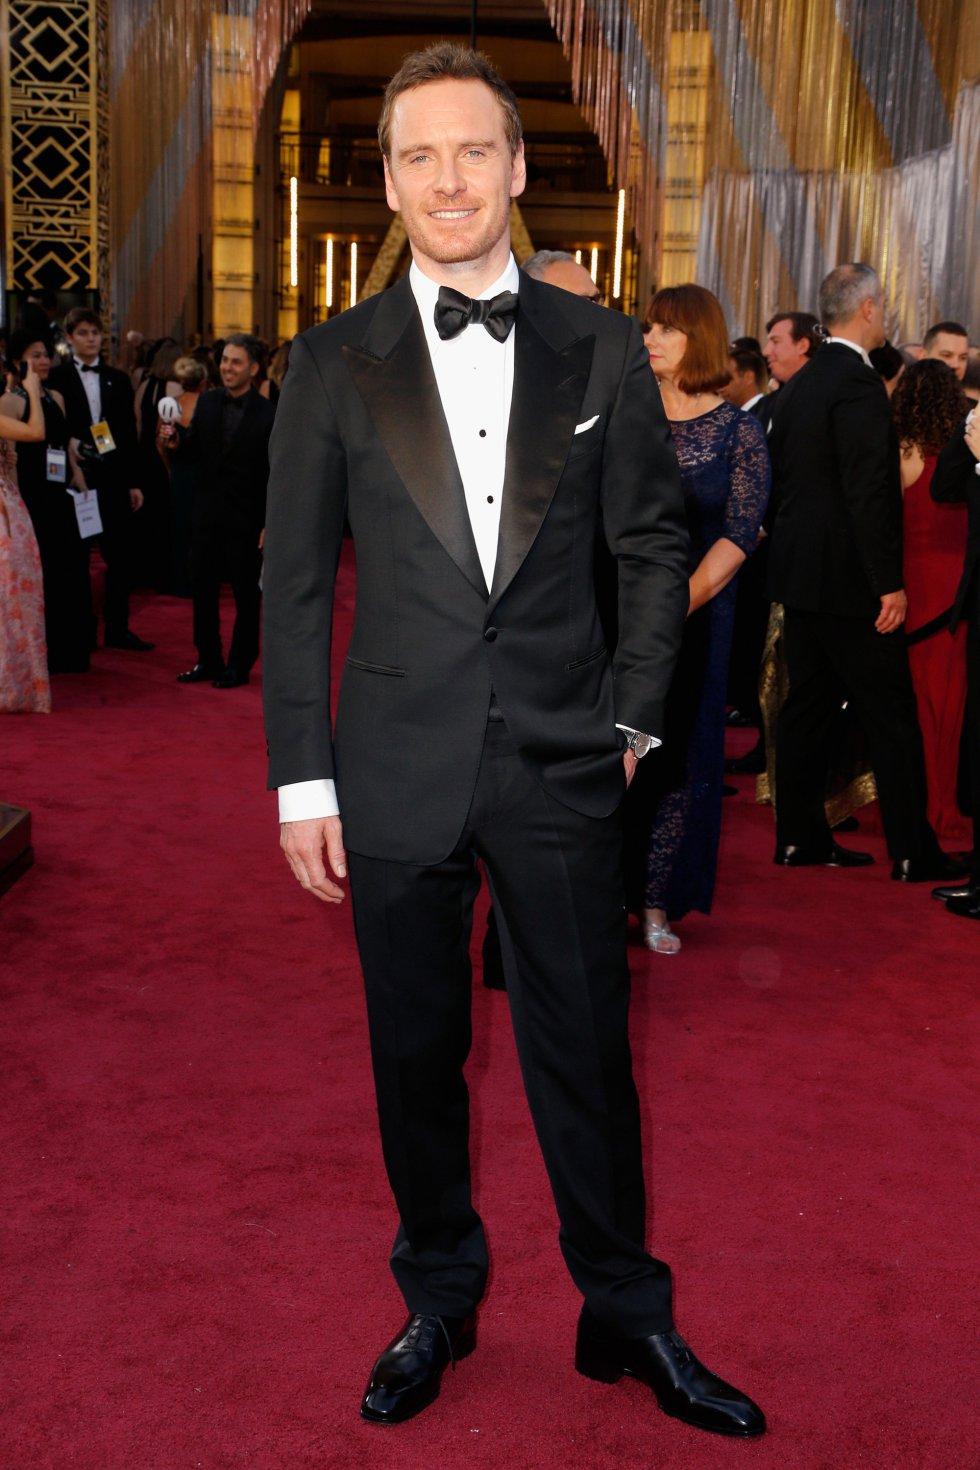 El actor Michael Fassbender